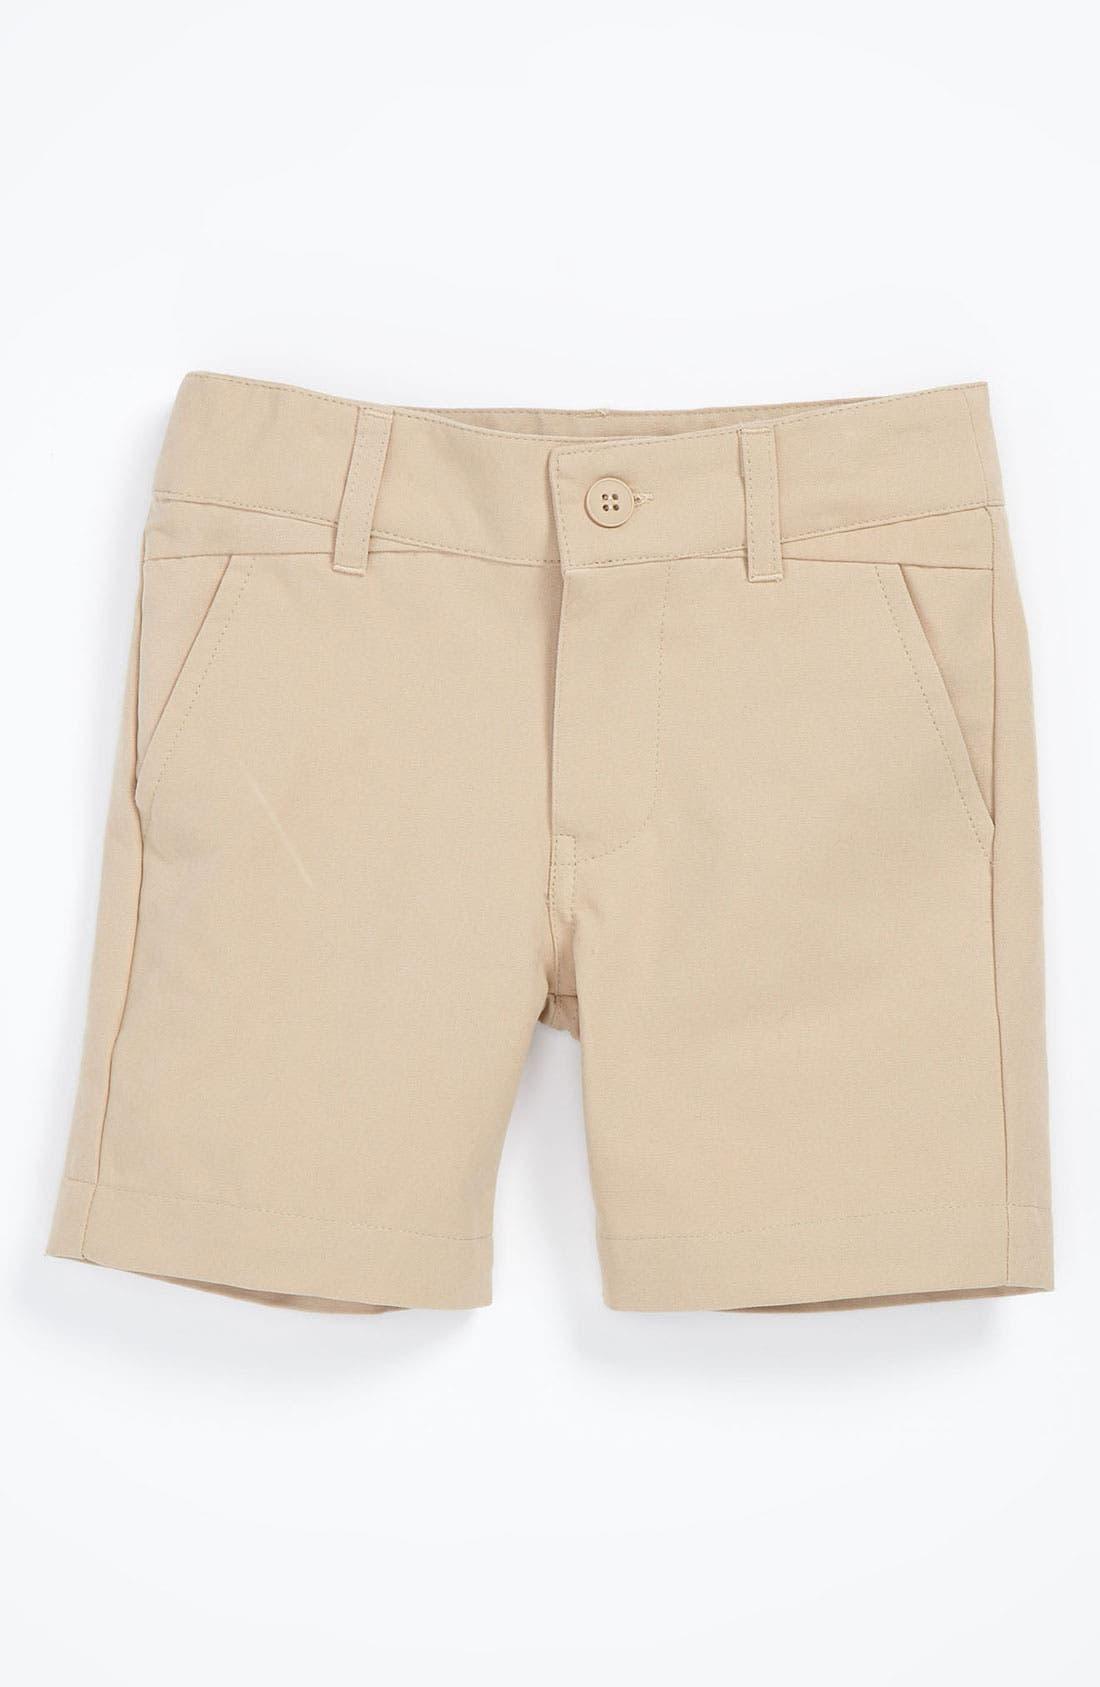 Alternate Image 1 Selected - Appaman Trouser Shorts (Toddler)